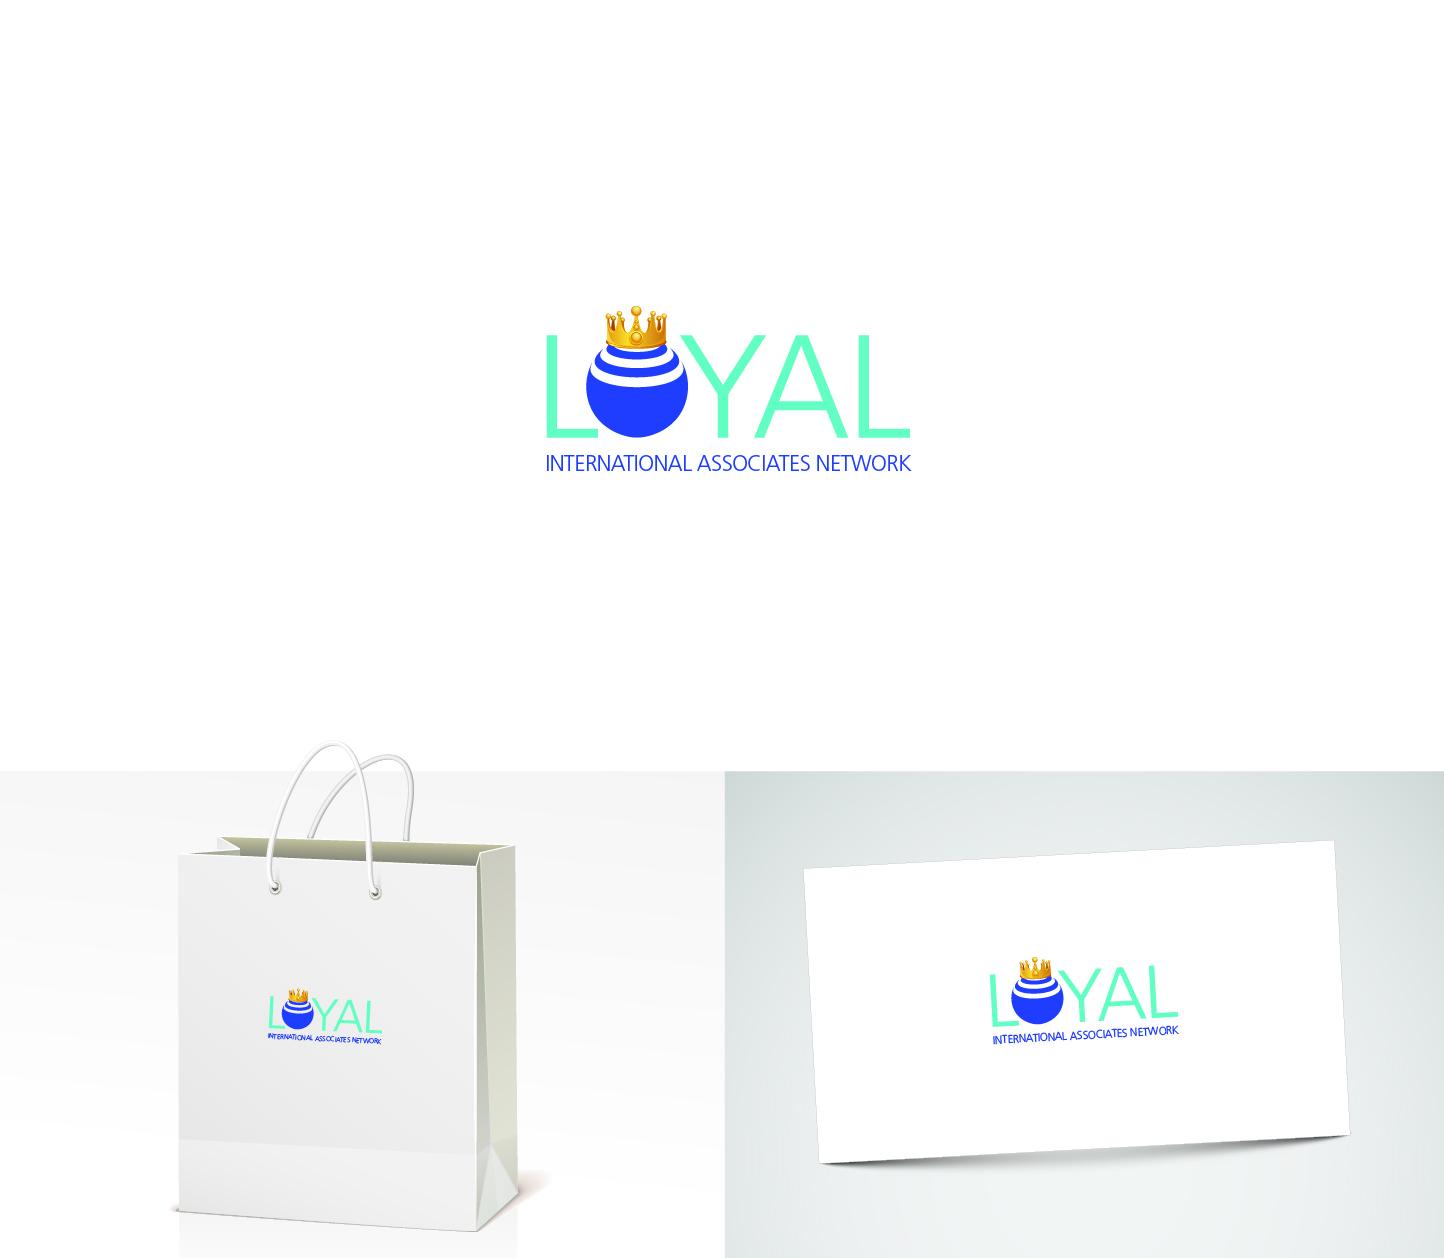 Serio moderno accommodation dise o de logo for loyal for Hispano international decor llc